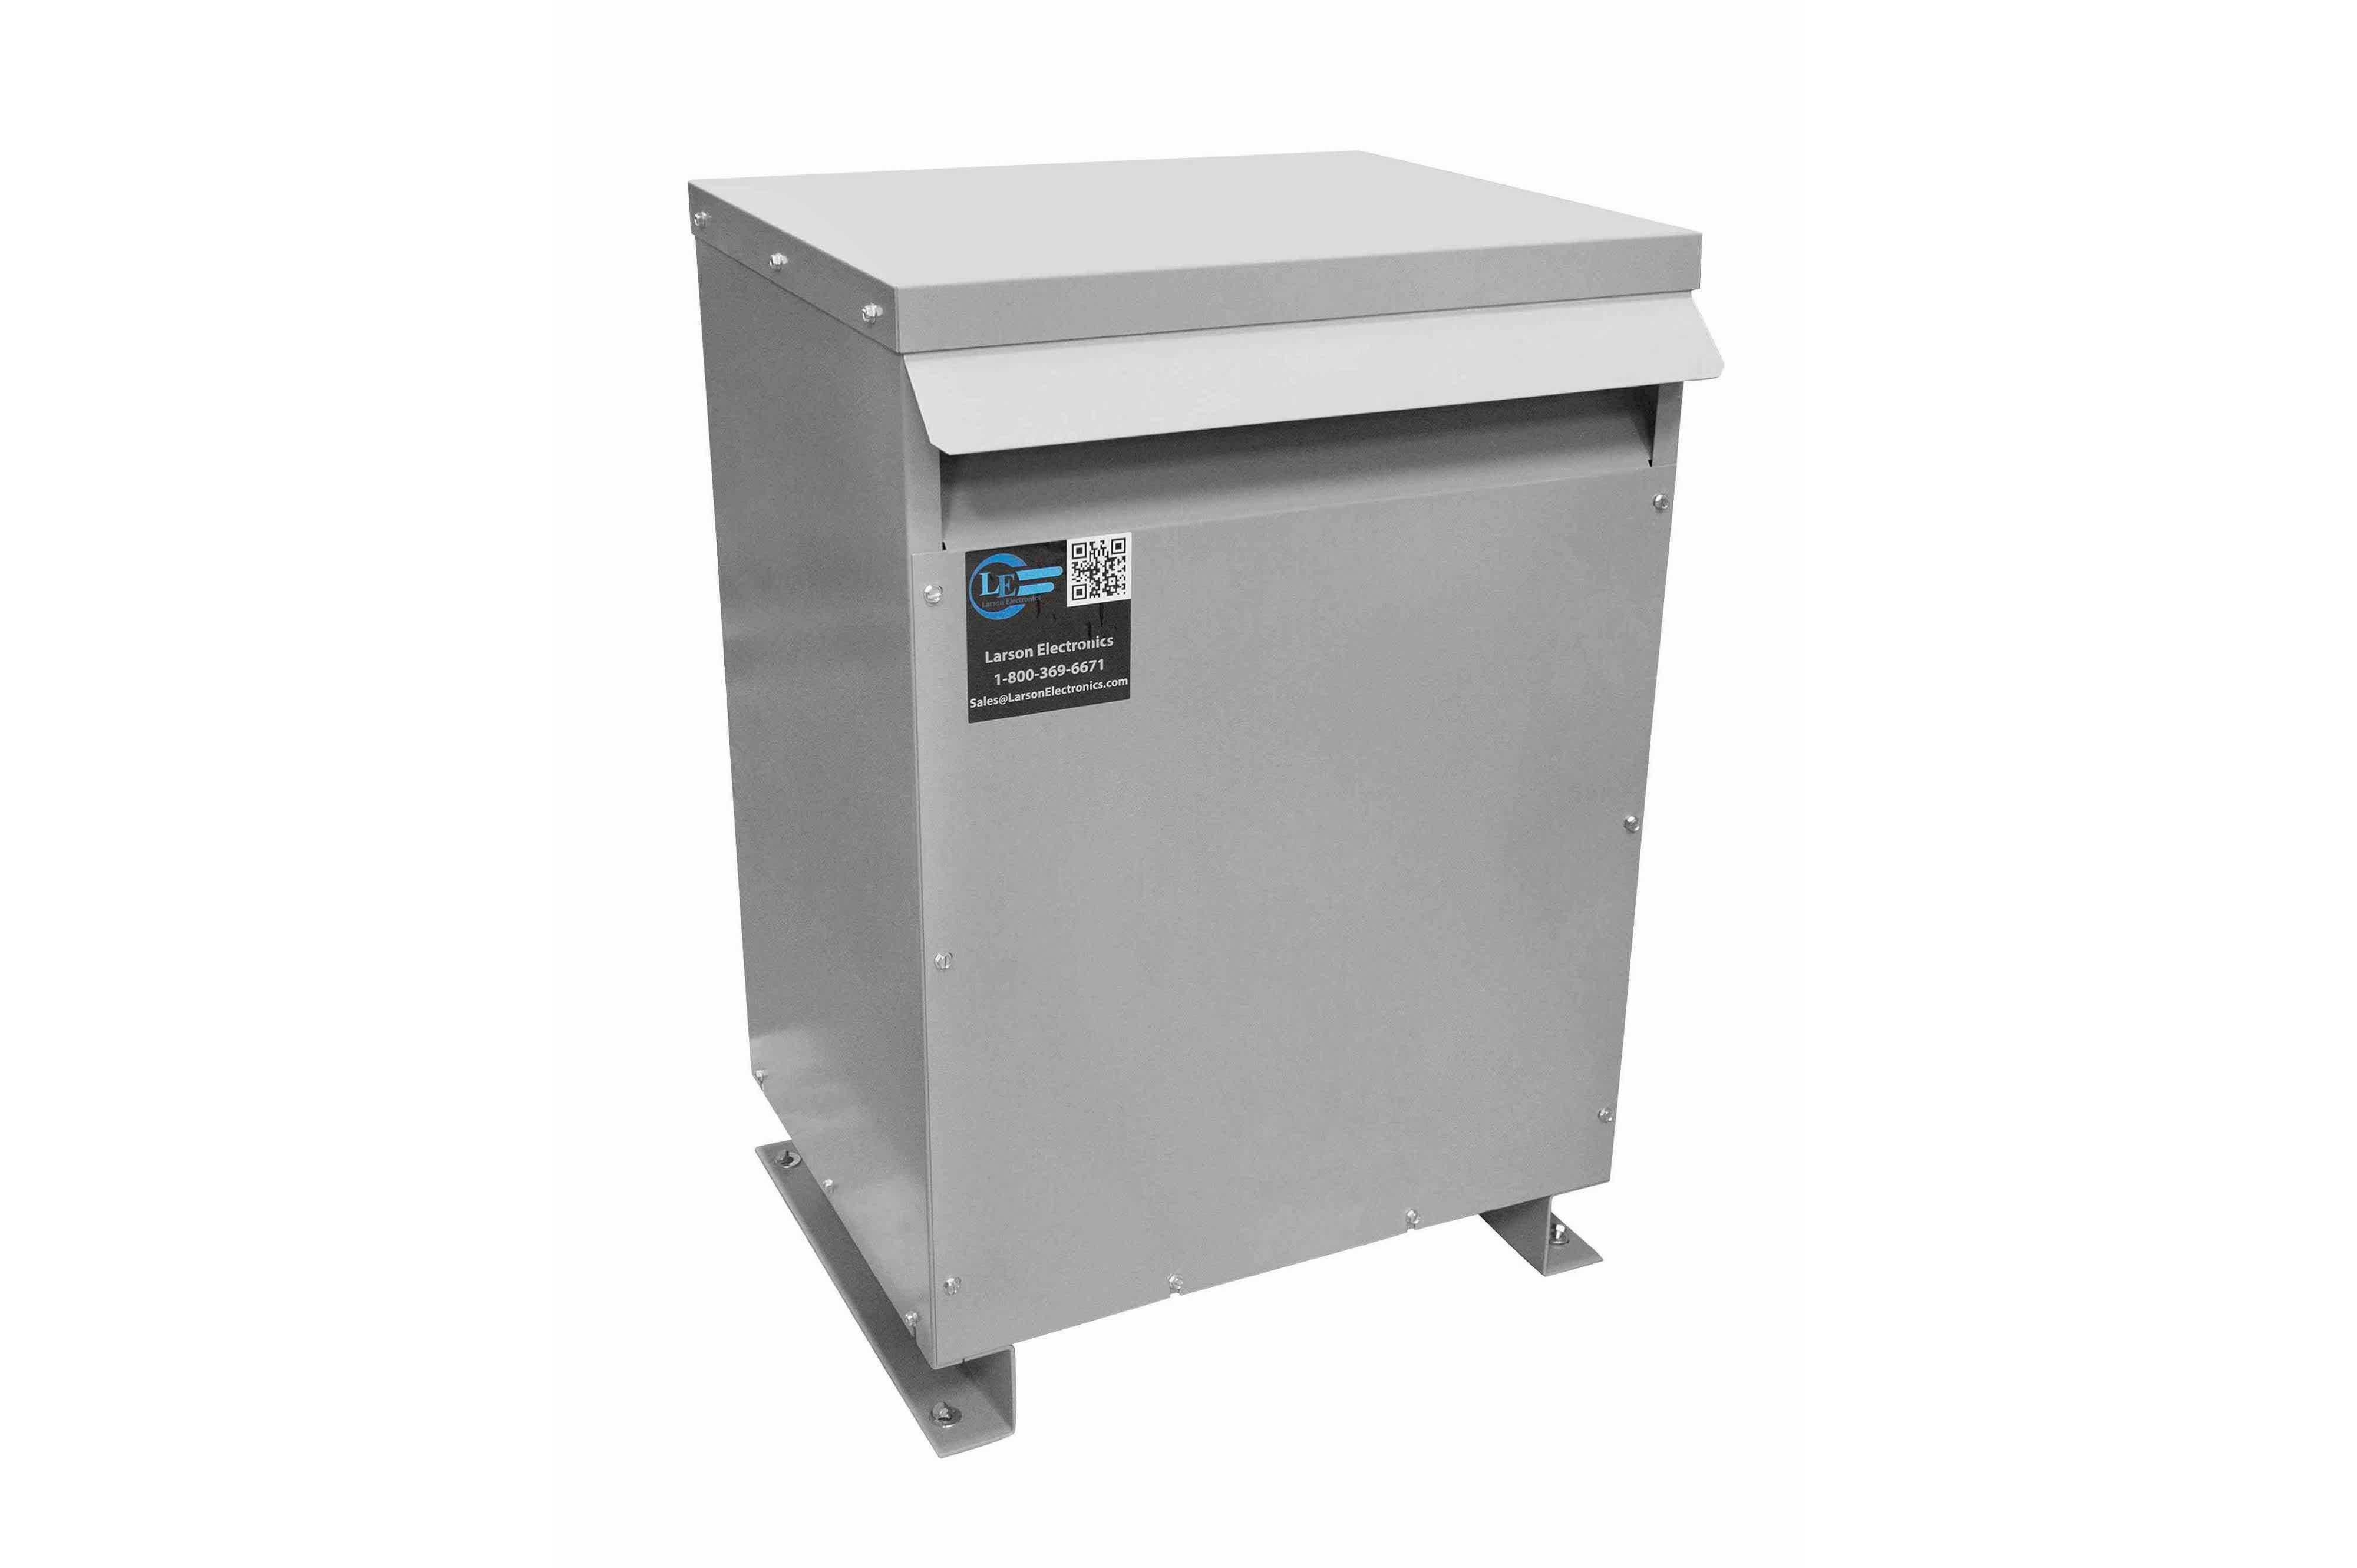 22.5 kVA 3PH Isolation Transformer, 380V Wye Primary, 480V Delta Secondary, N3R, Ventilated, 60 Hz